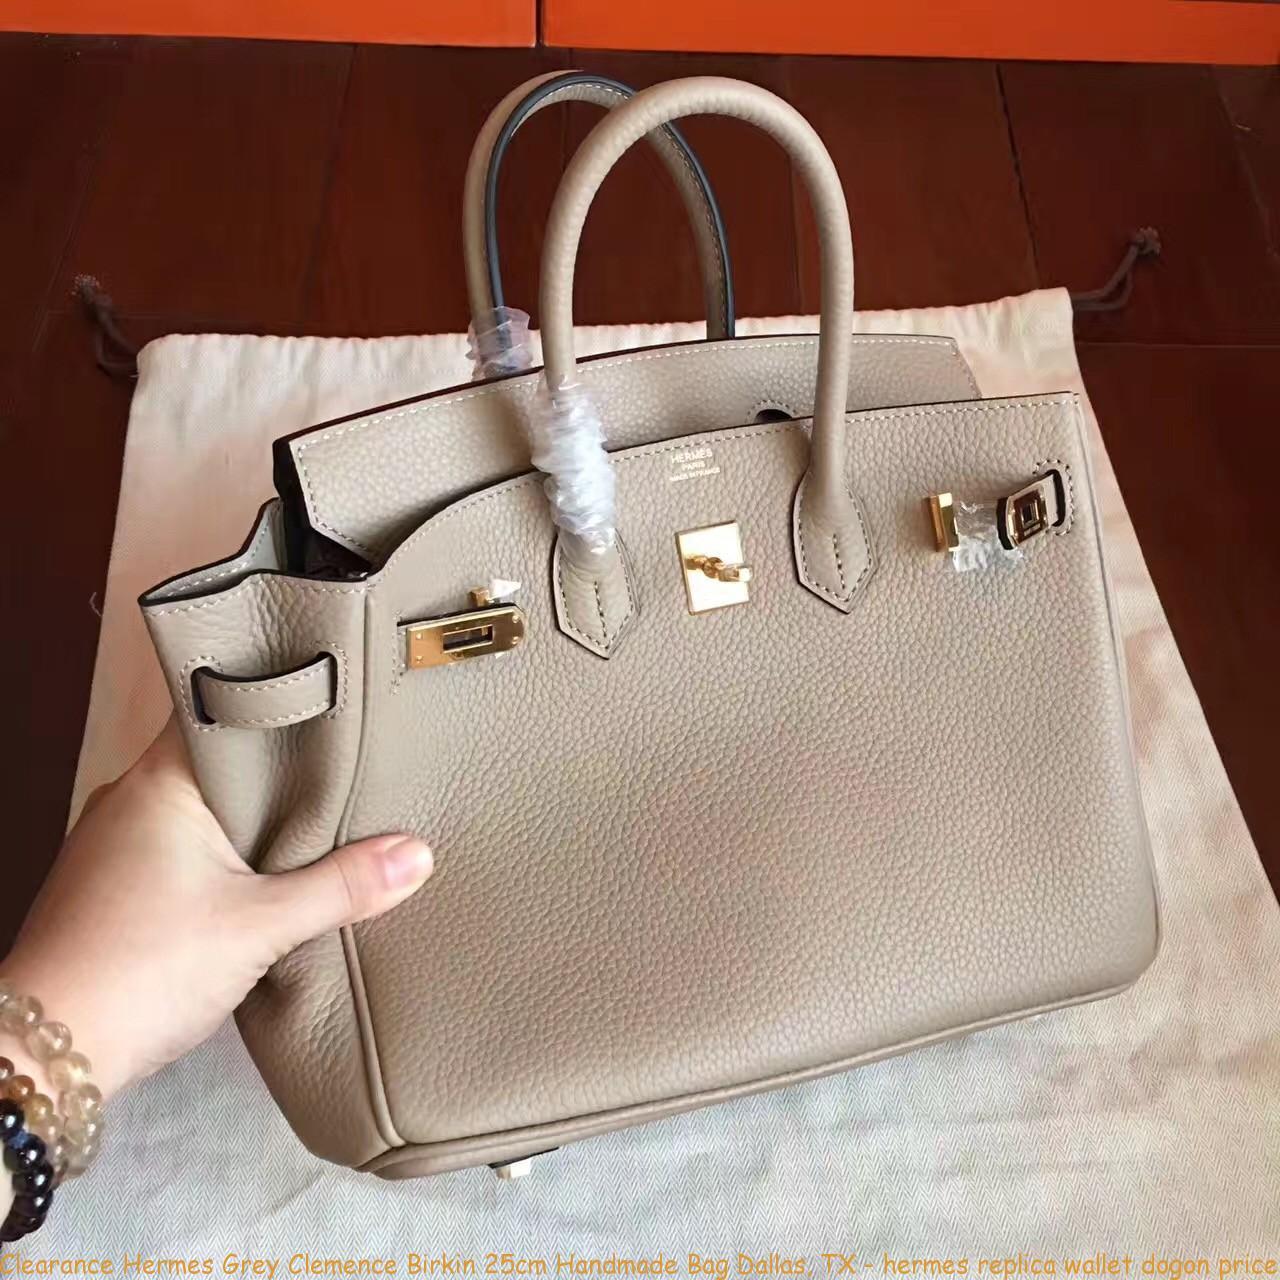 Clearance Hermes Grey Clemence Birkin 25cm Handmade Bag Dallas adc633db64b84